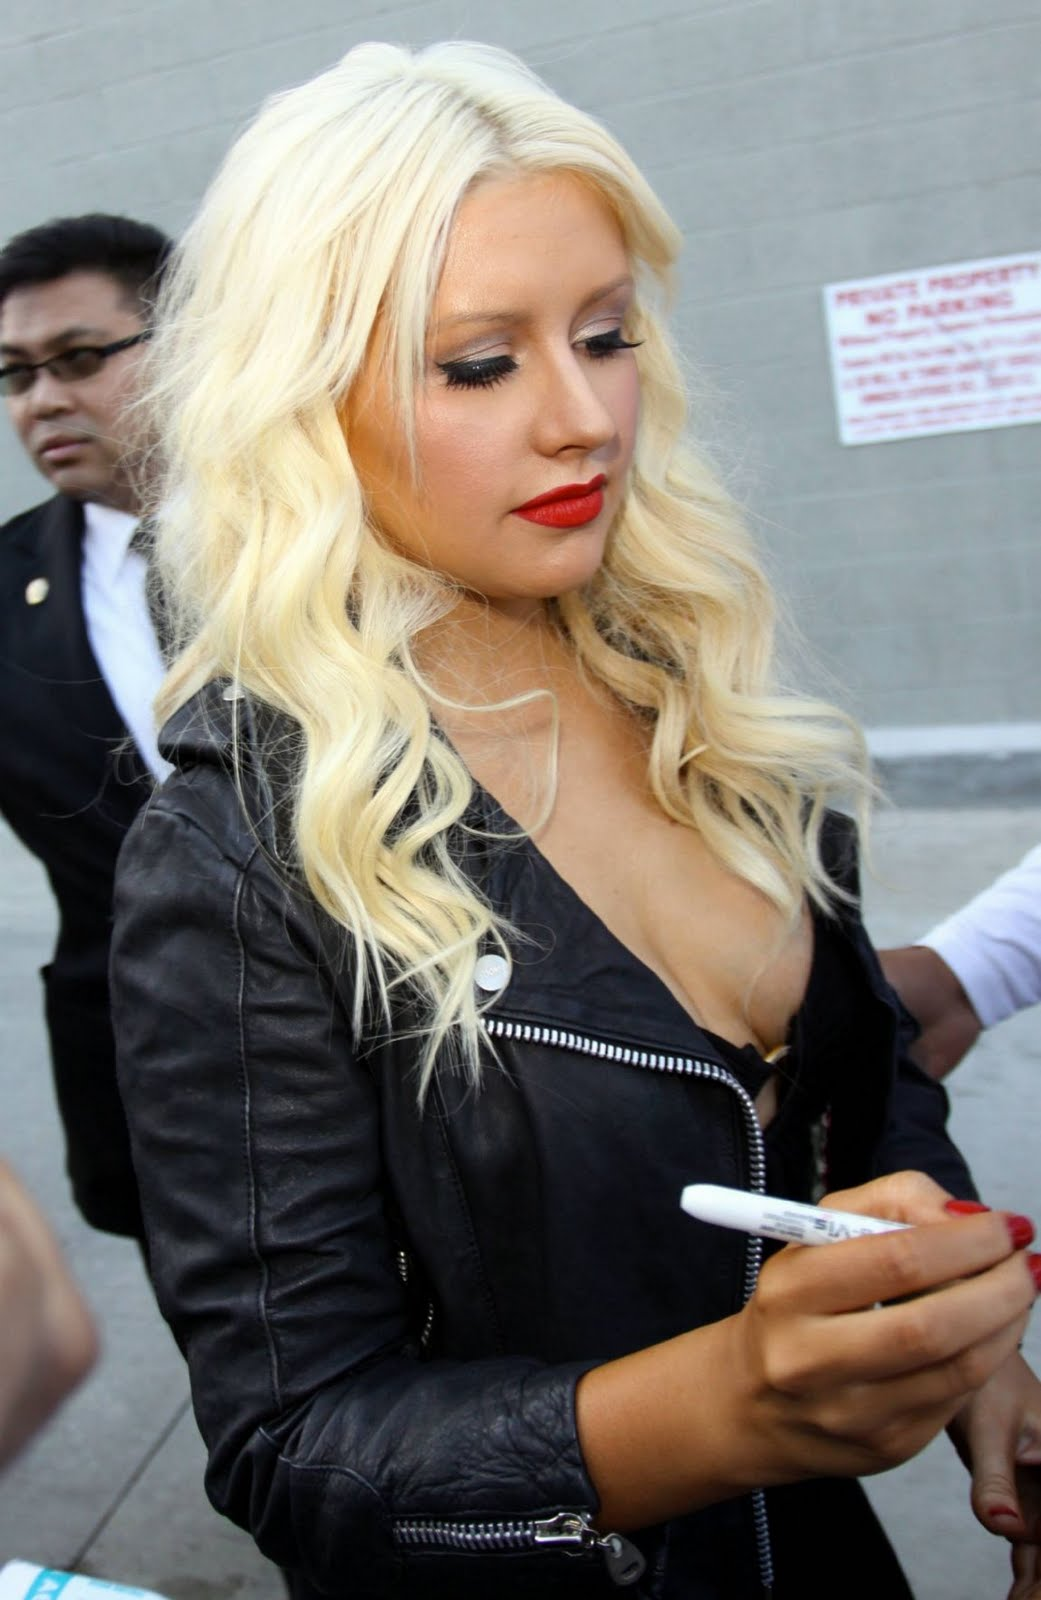 http://1.bp.blogspot.com/-dCYu7xMlNBk/TeZn3jRRyuI/AAAAAAAAKco/mBaUyhh4HH0/s1600/Singer+Christina+Aguilera+giving+autographs+in+public+2011+%25281%2529.jpg